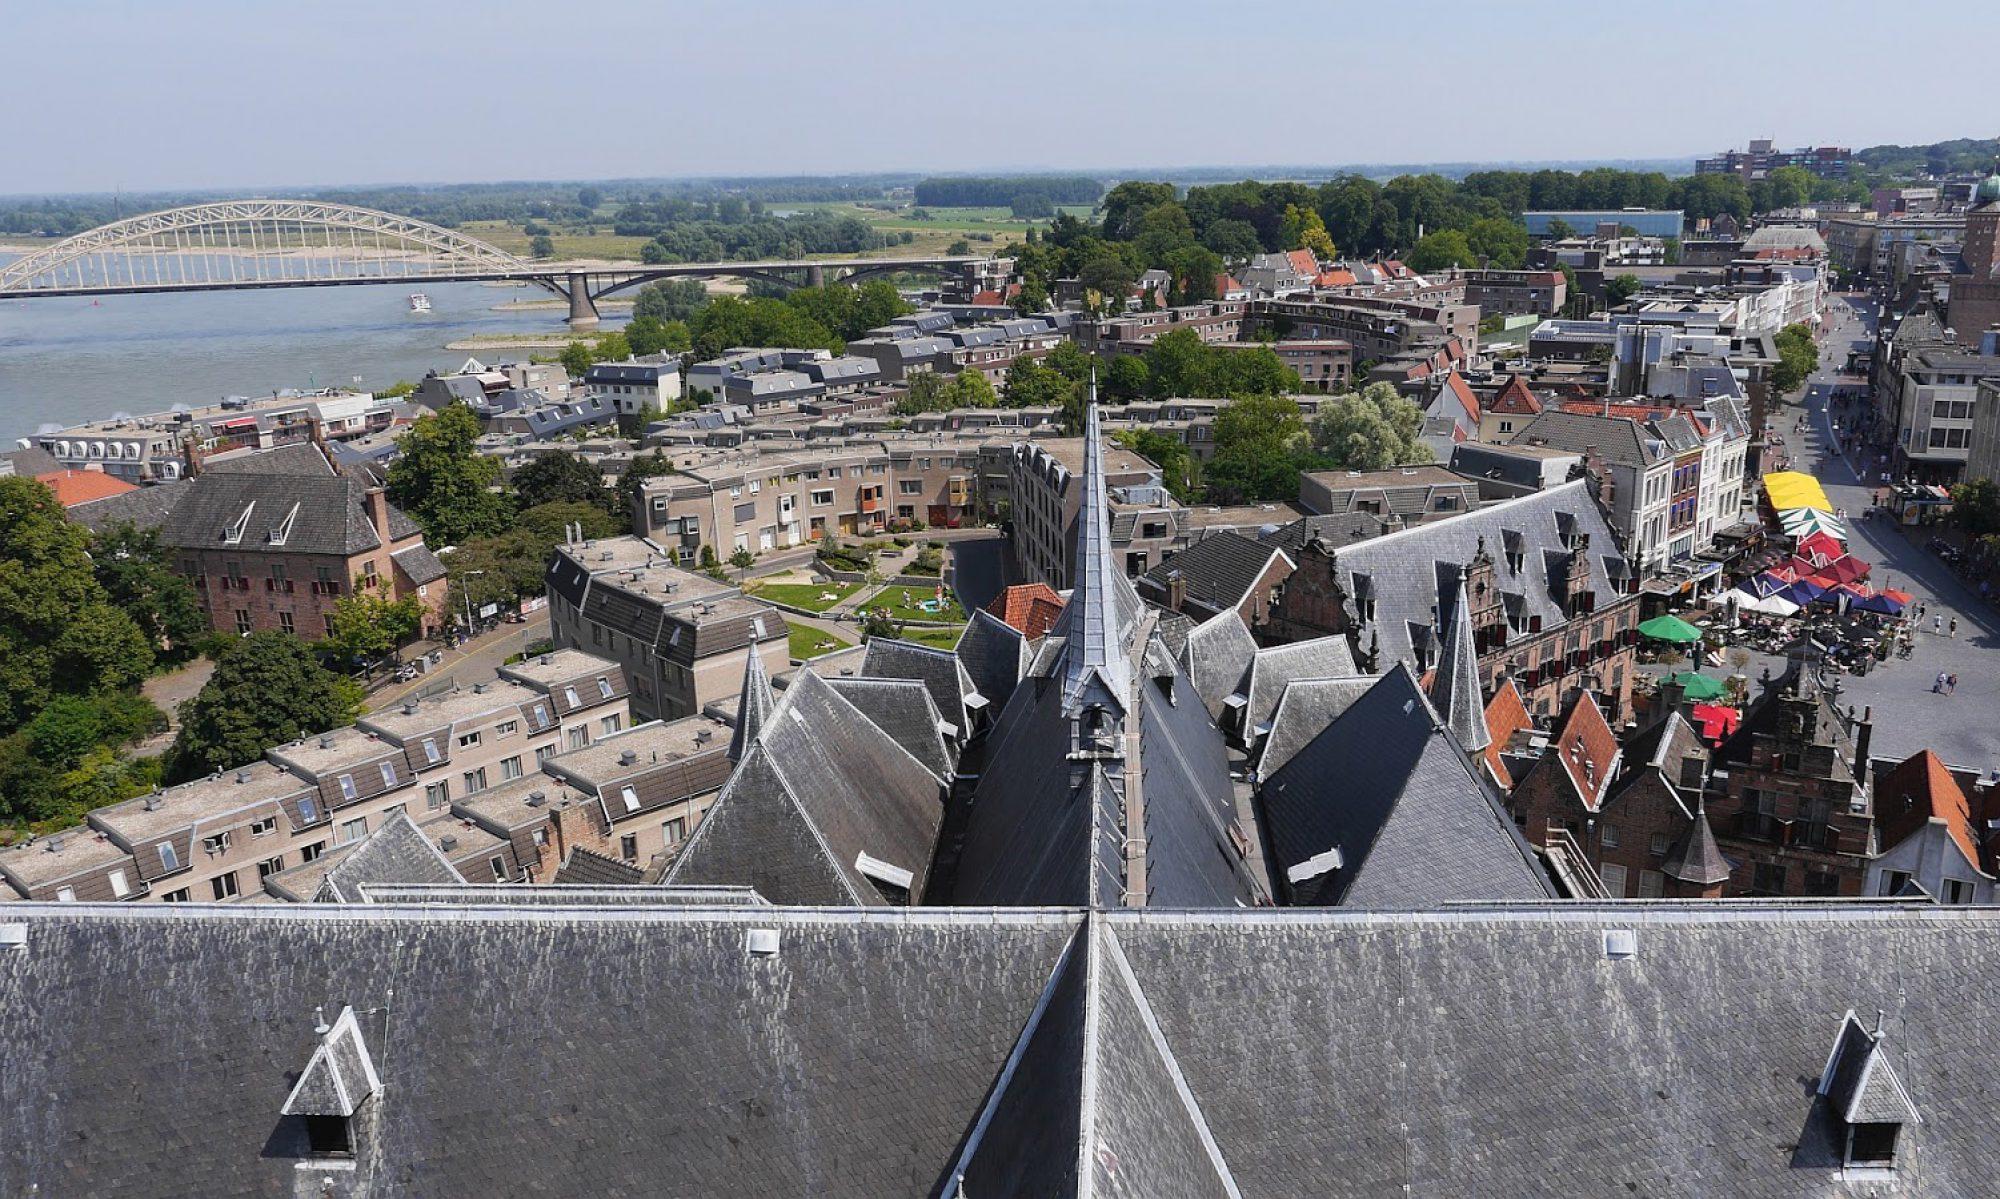 Buurtcomité Benedenstad Nijmegen